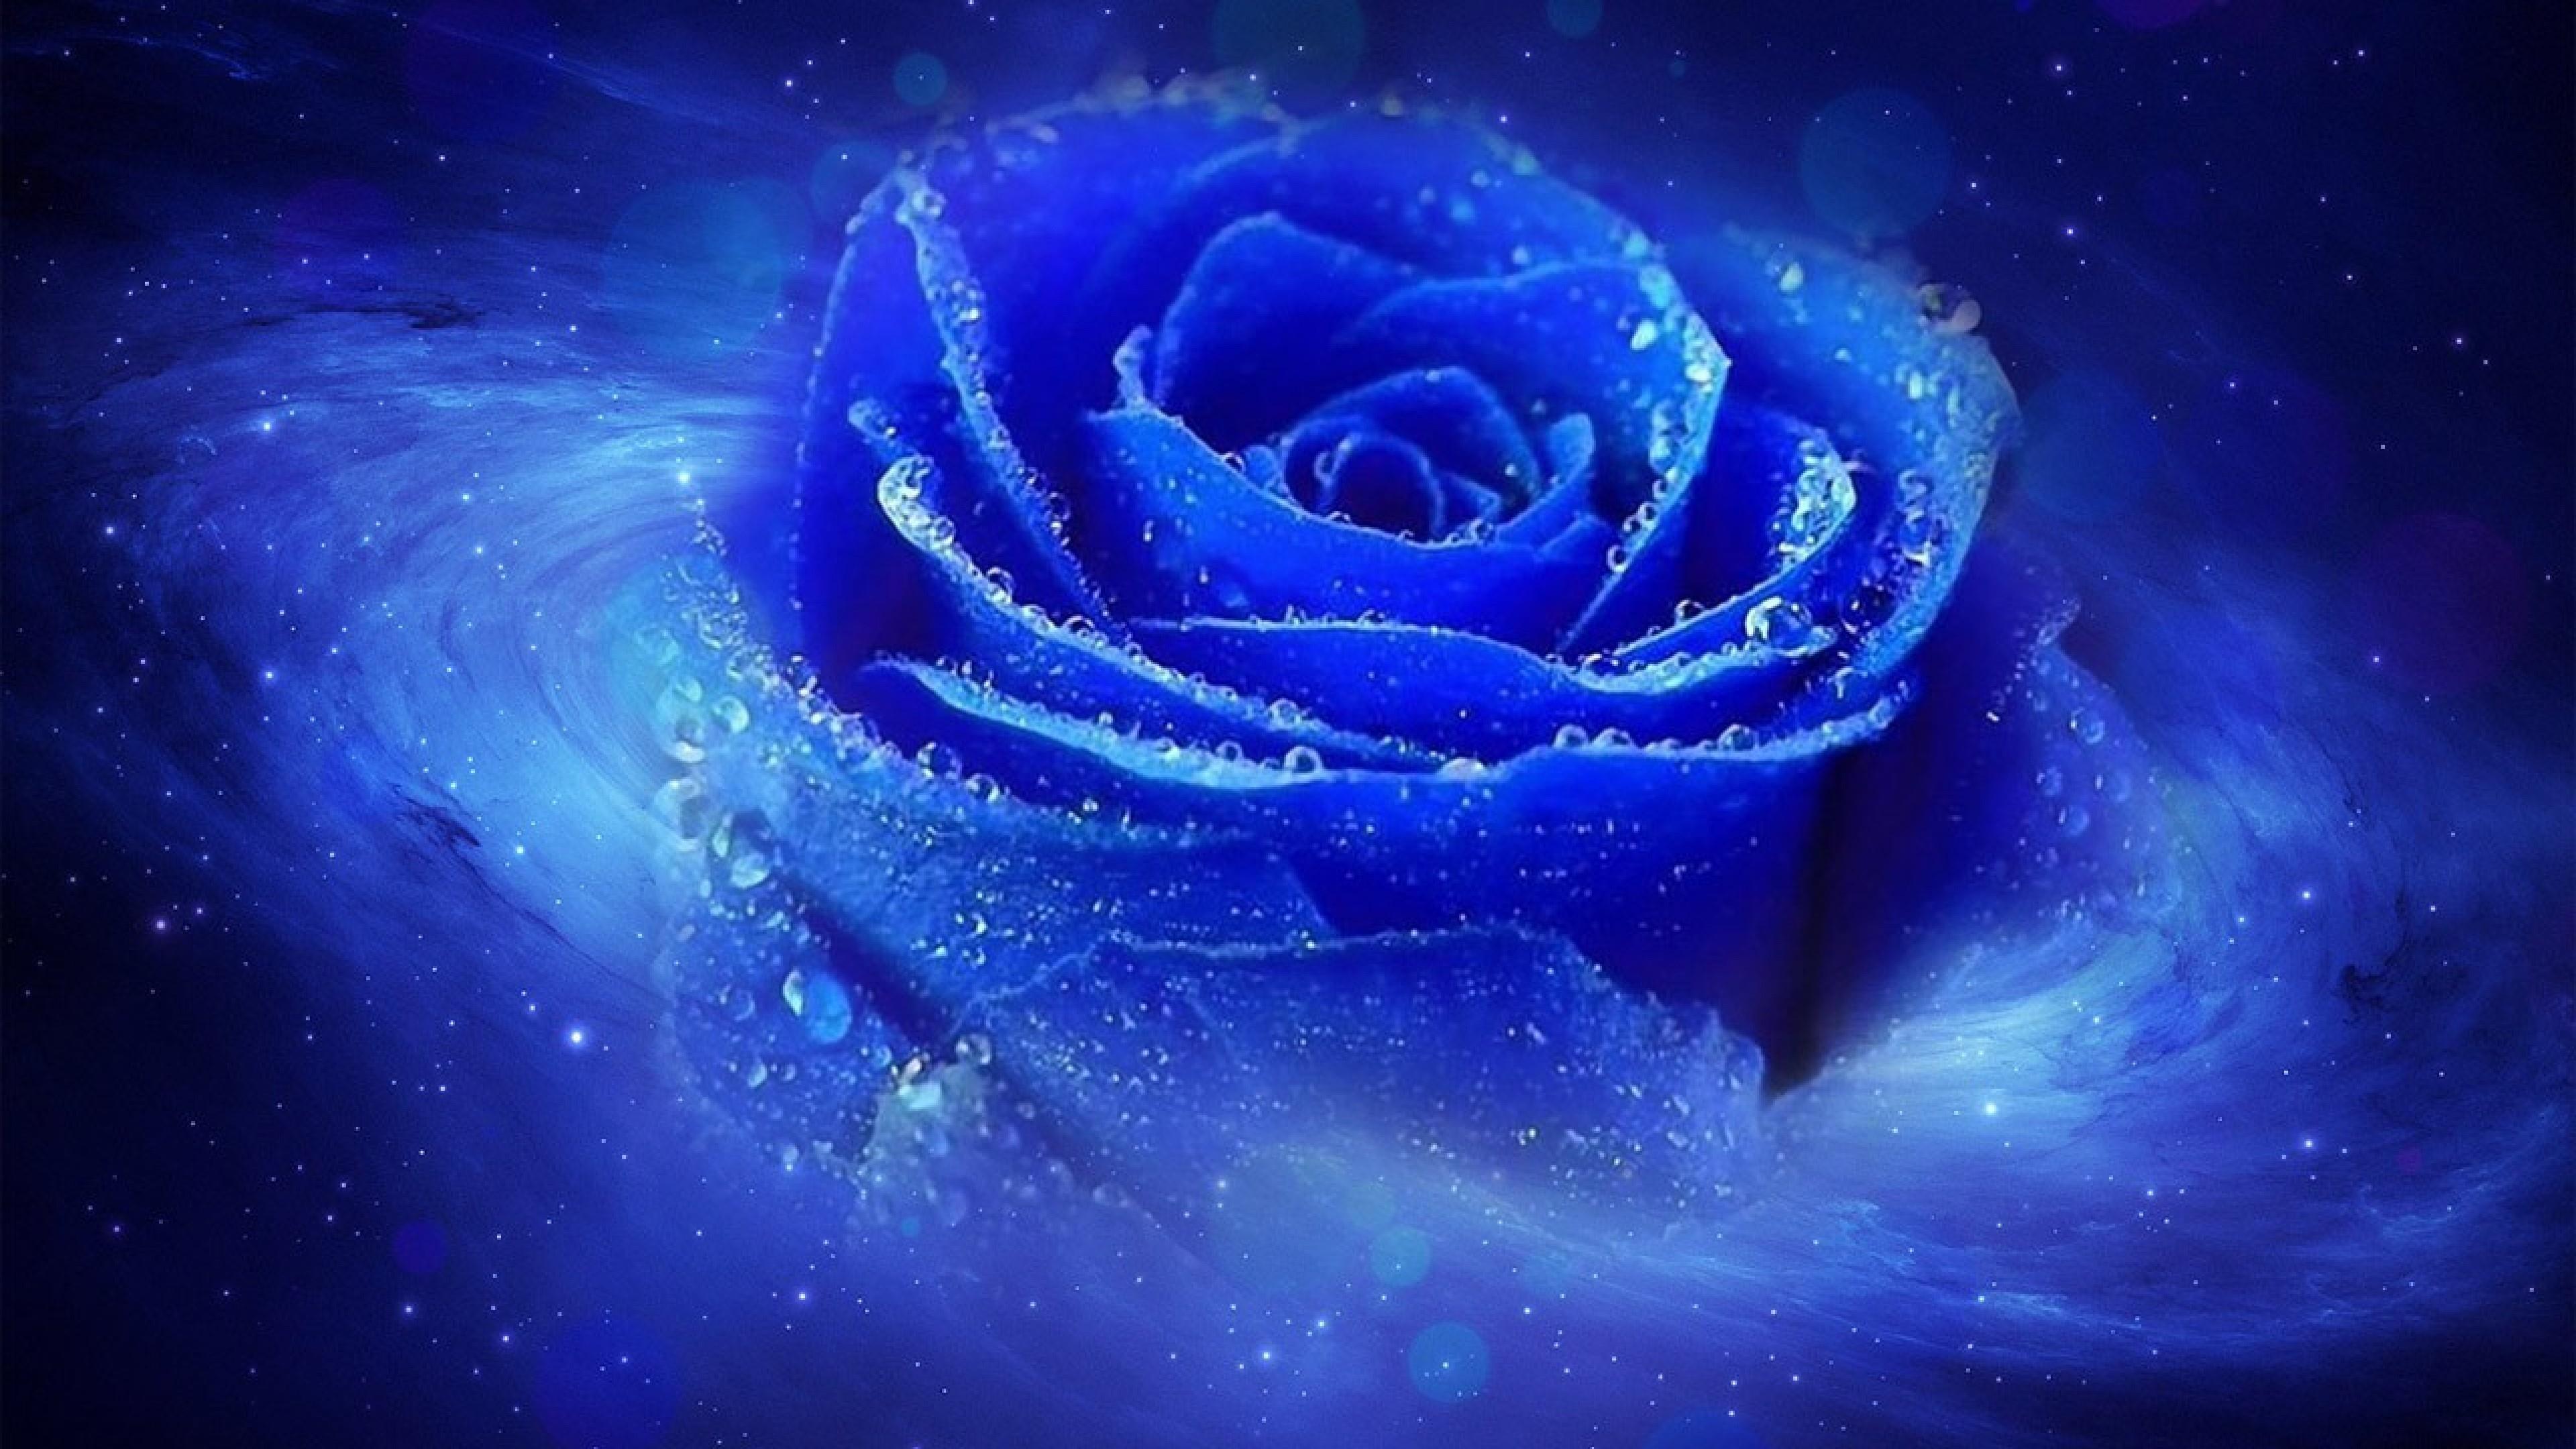 Cool blue dewy rose wallpaper